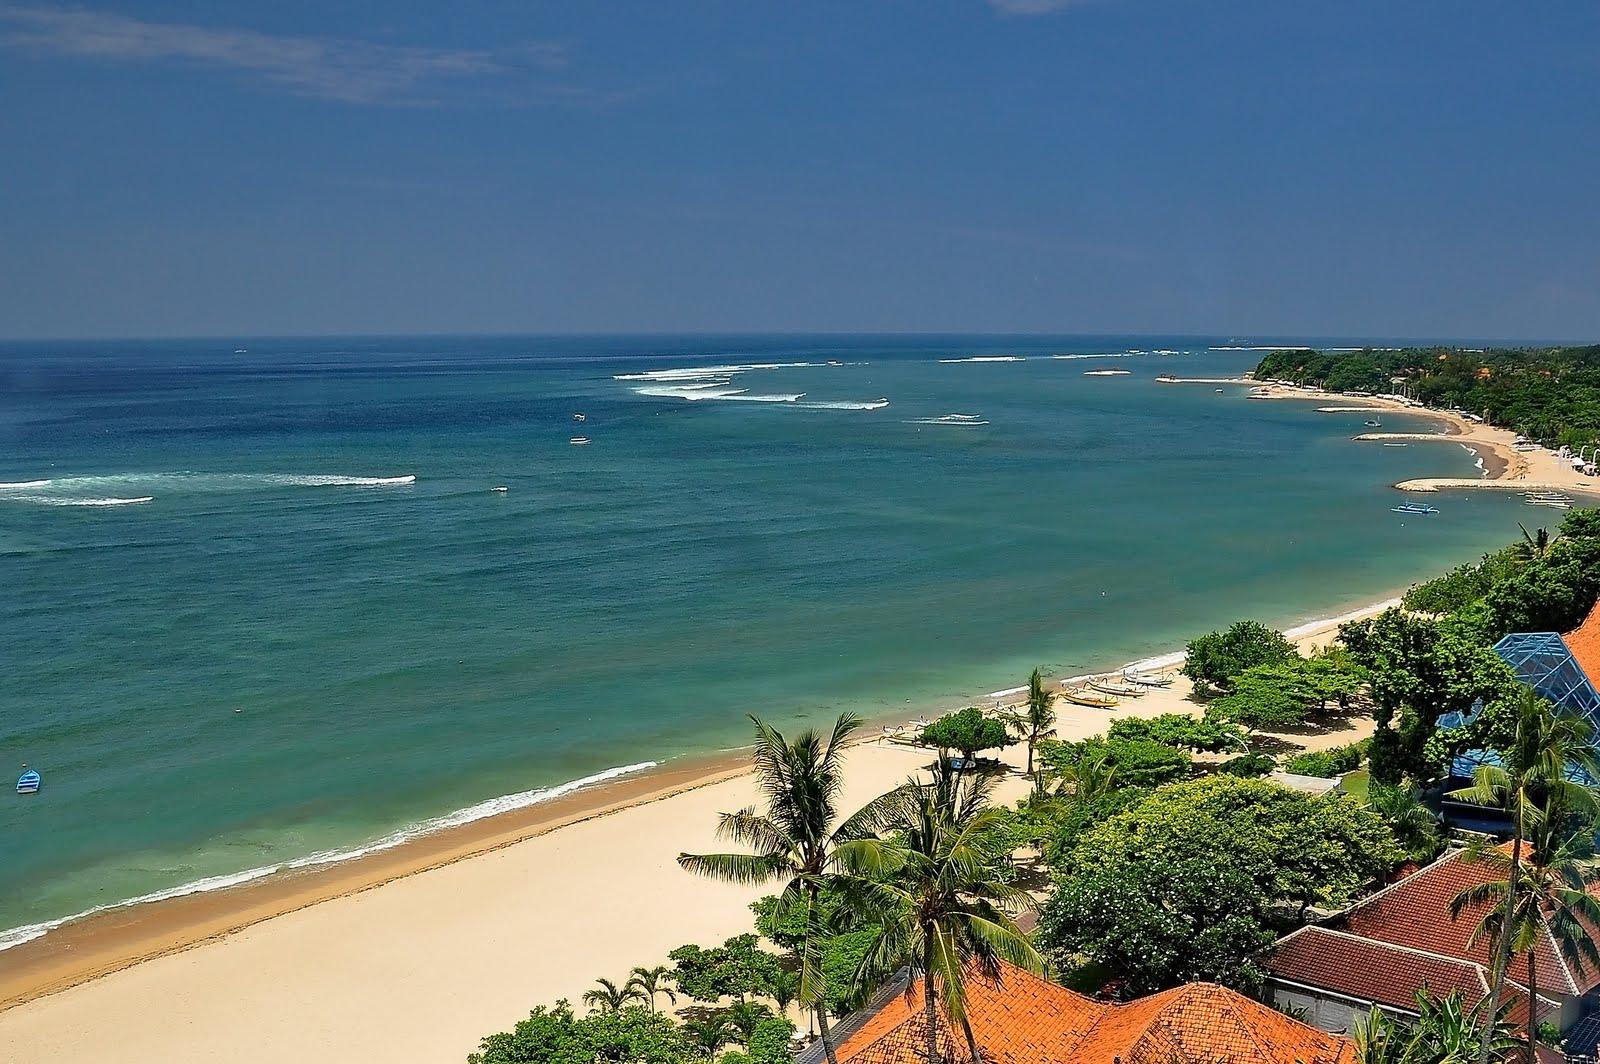 Nature wallpaper sanur beach bali indonesia for Best beach hotels in bali